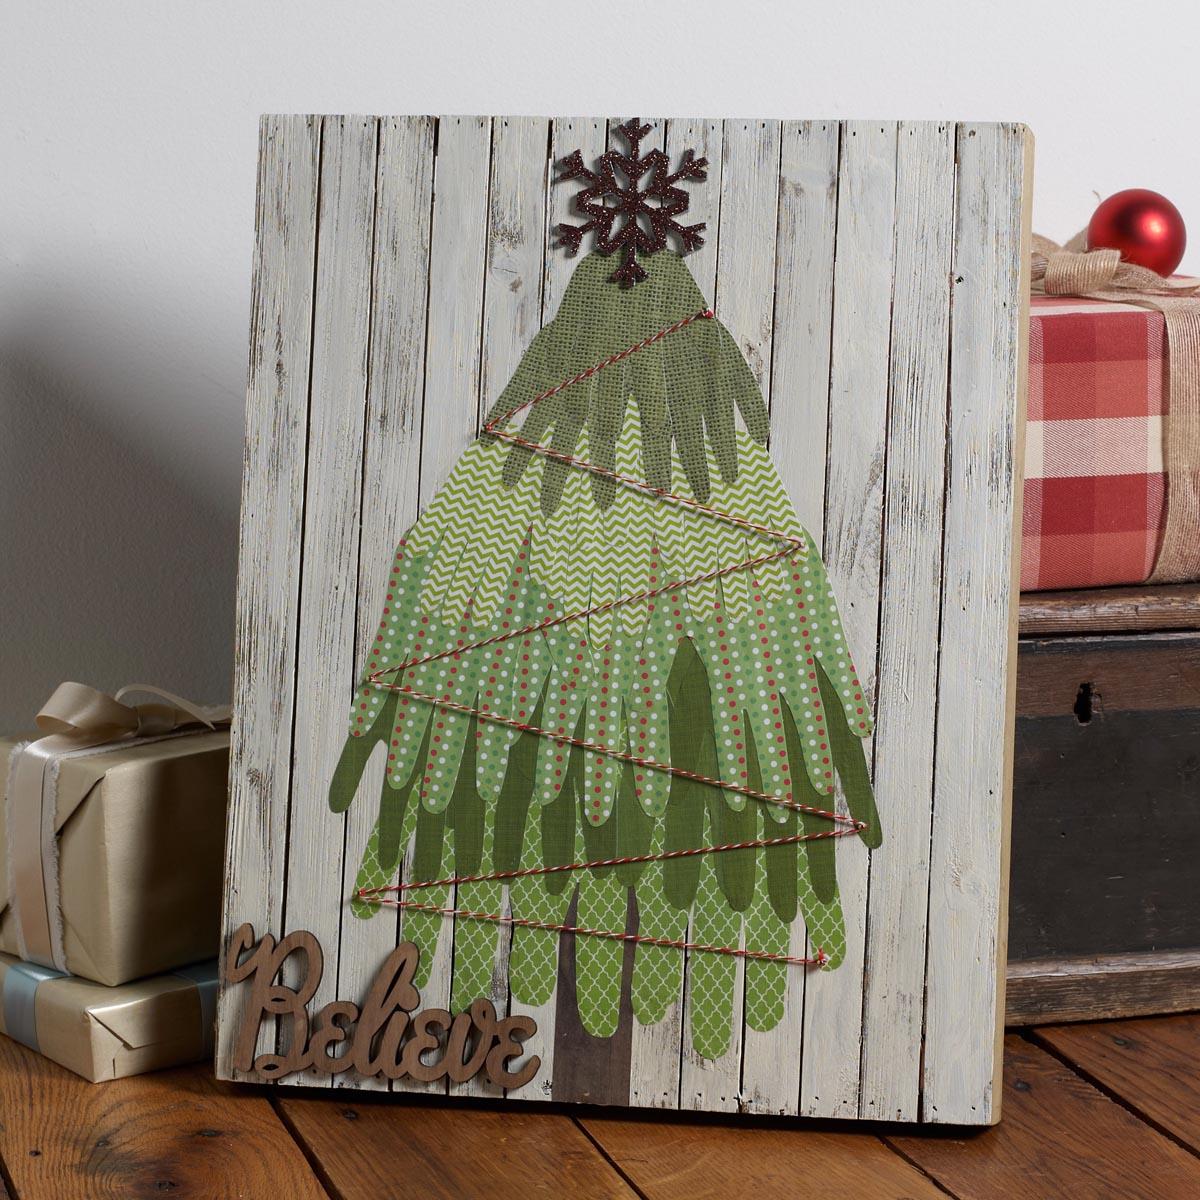 Kids Handprint Christmas Tree Craft Project